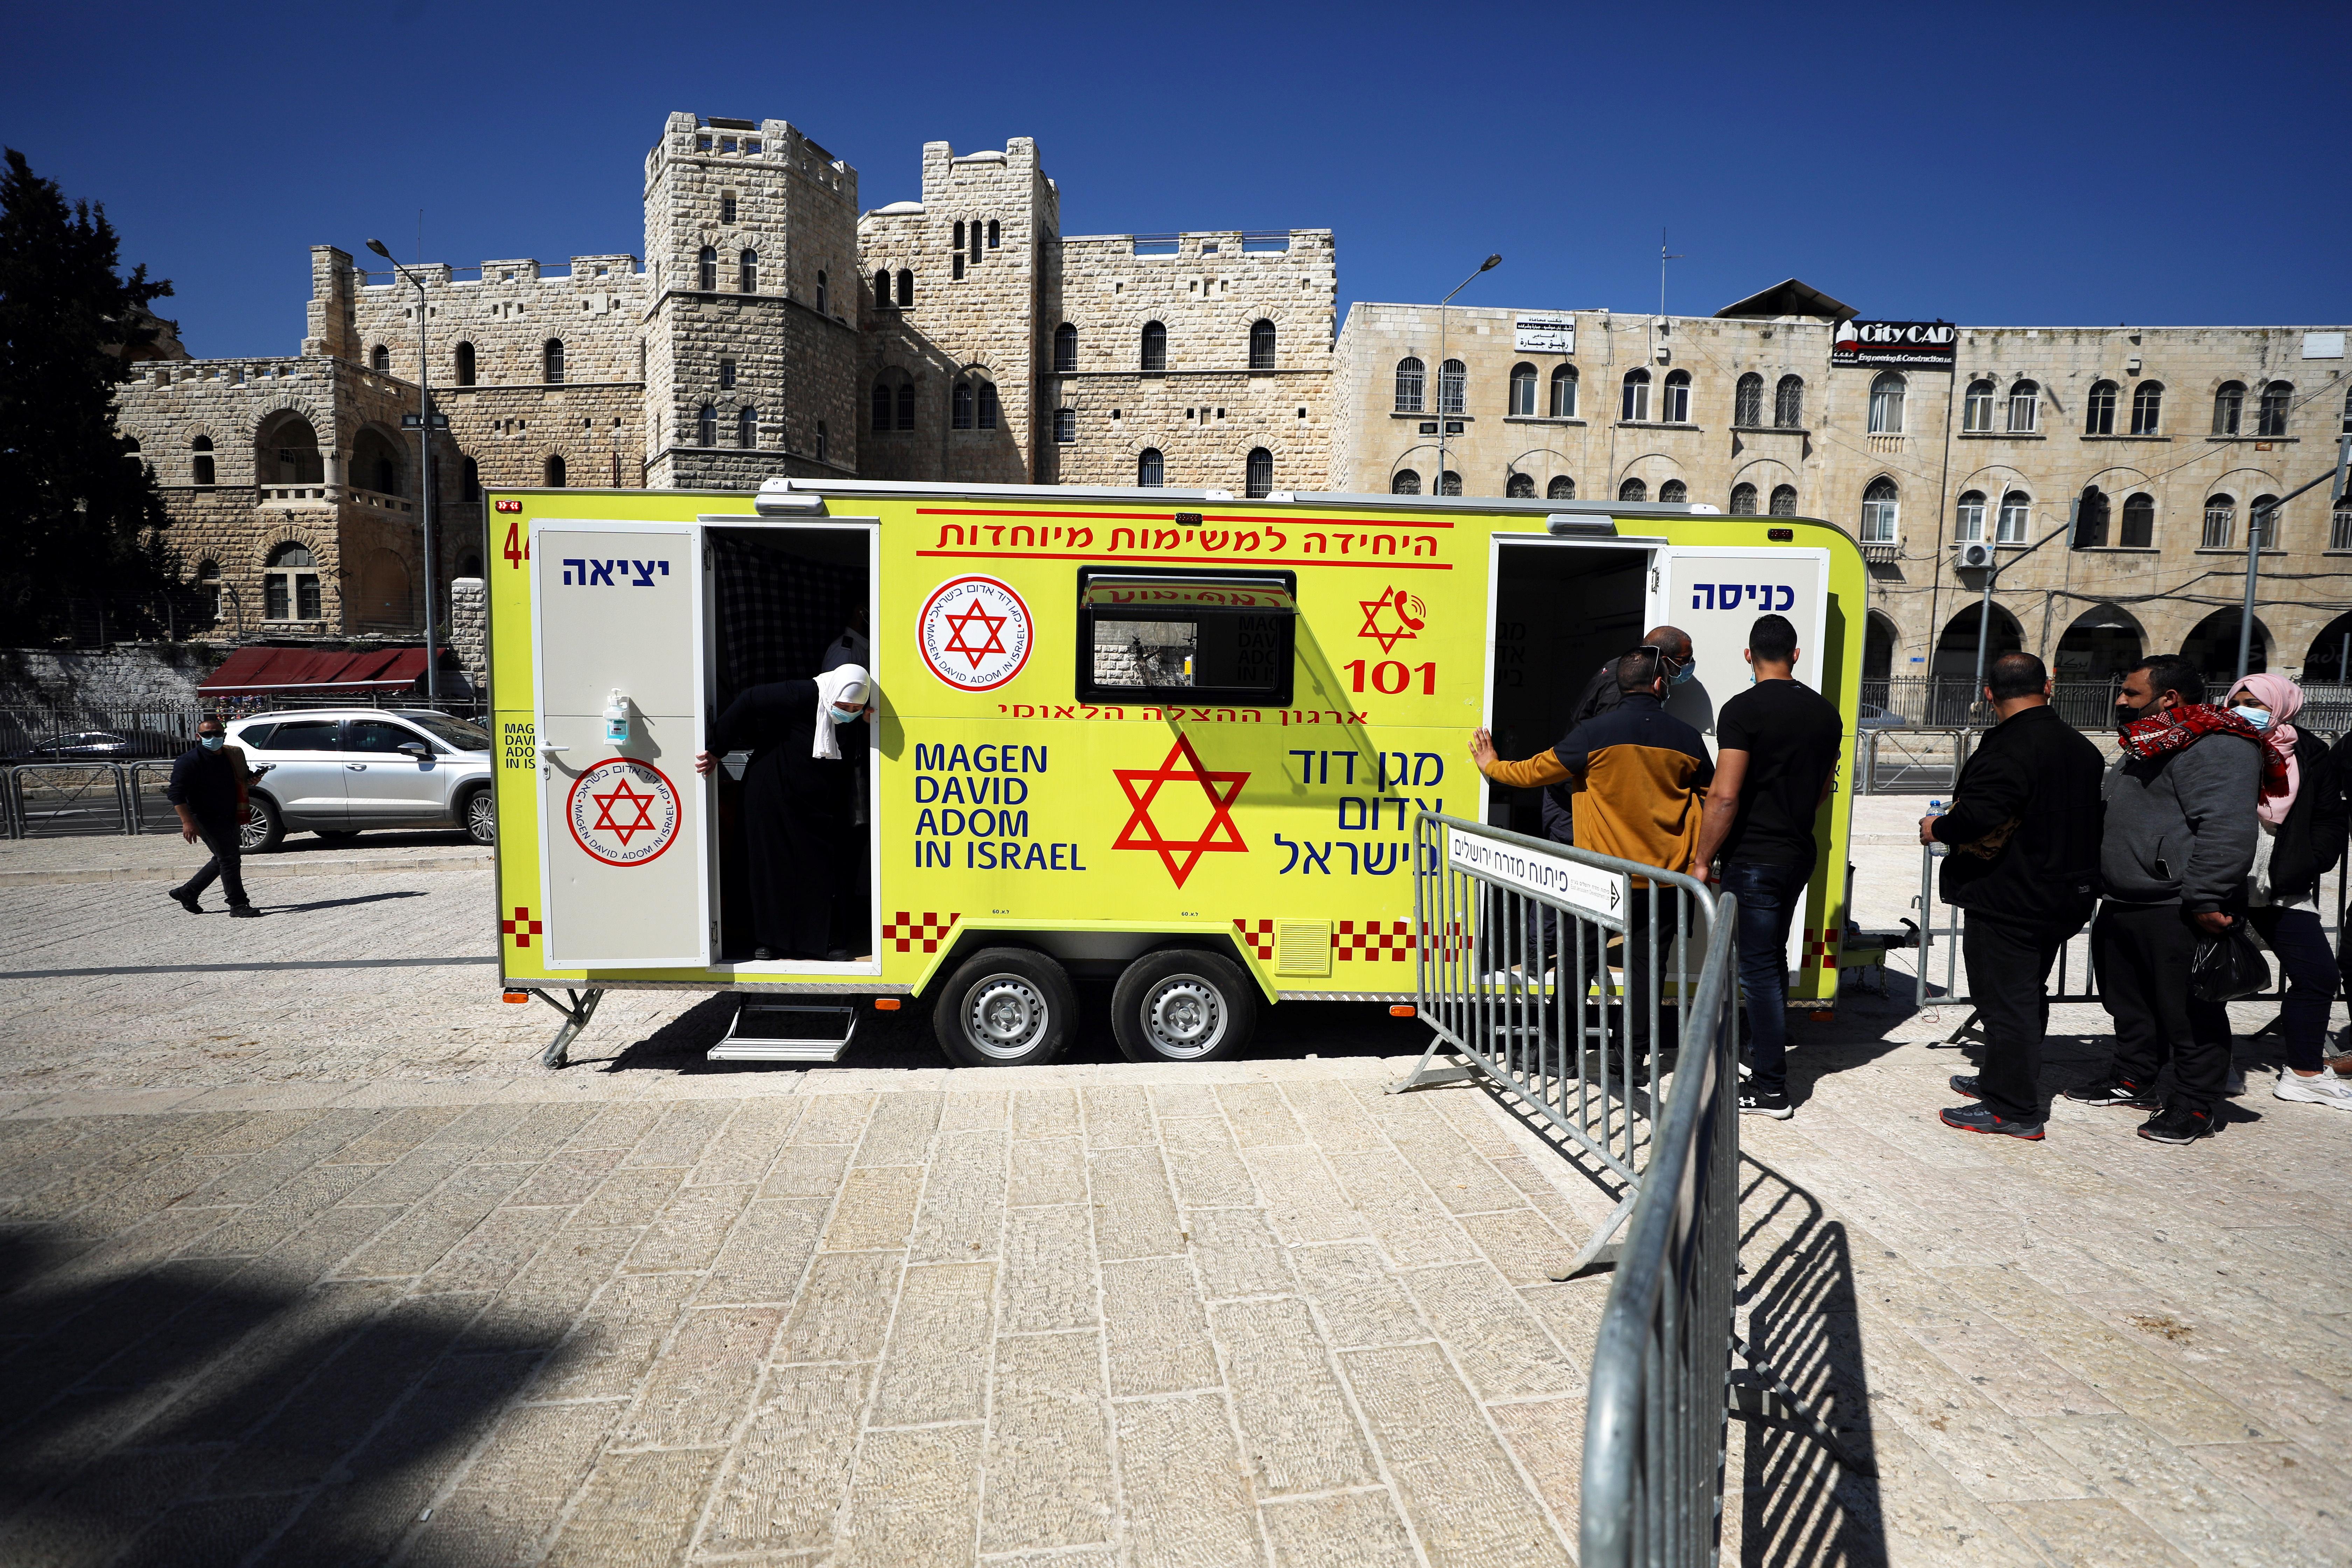 A mobile vaccination center in Jerusalem, Israel